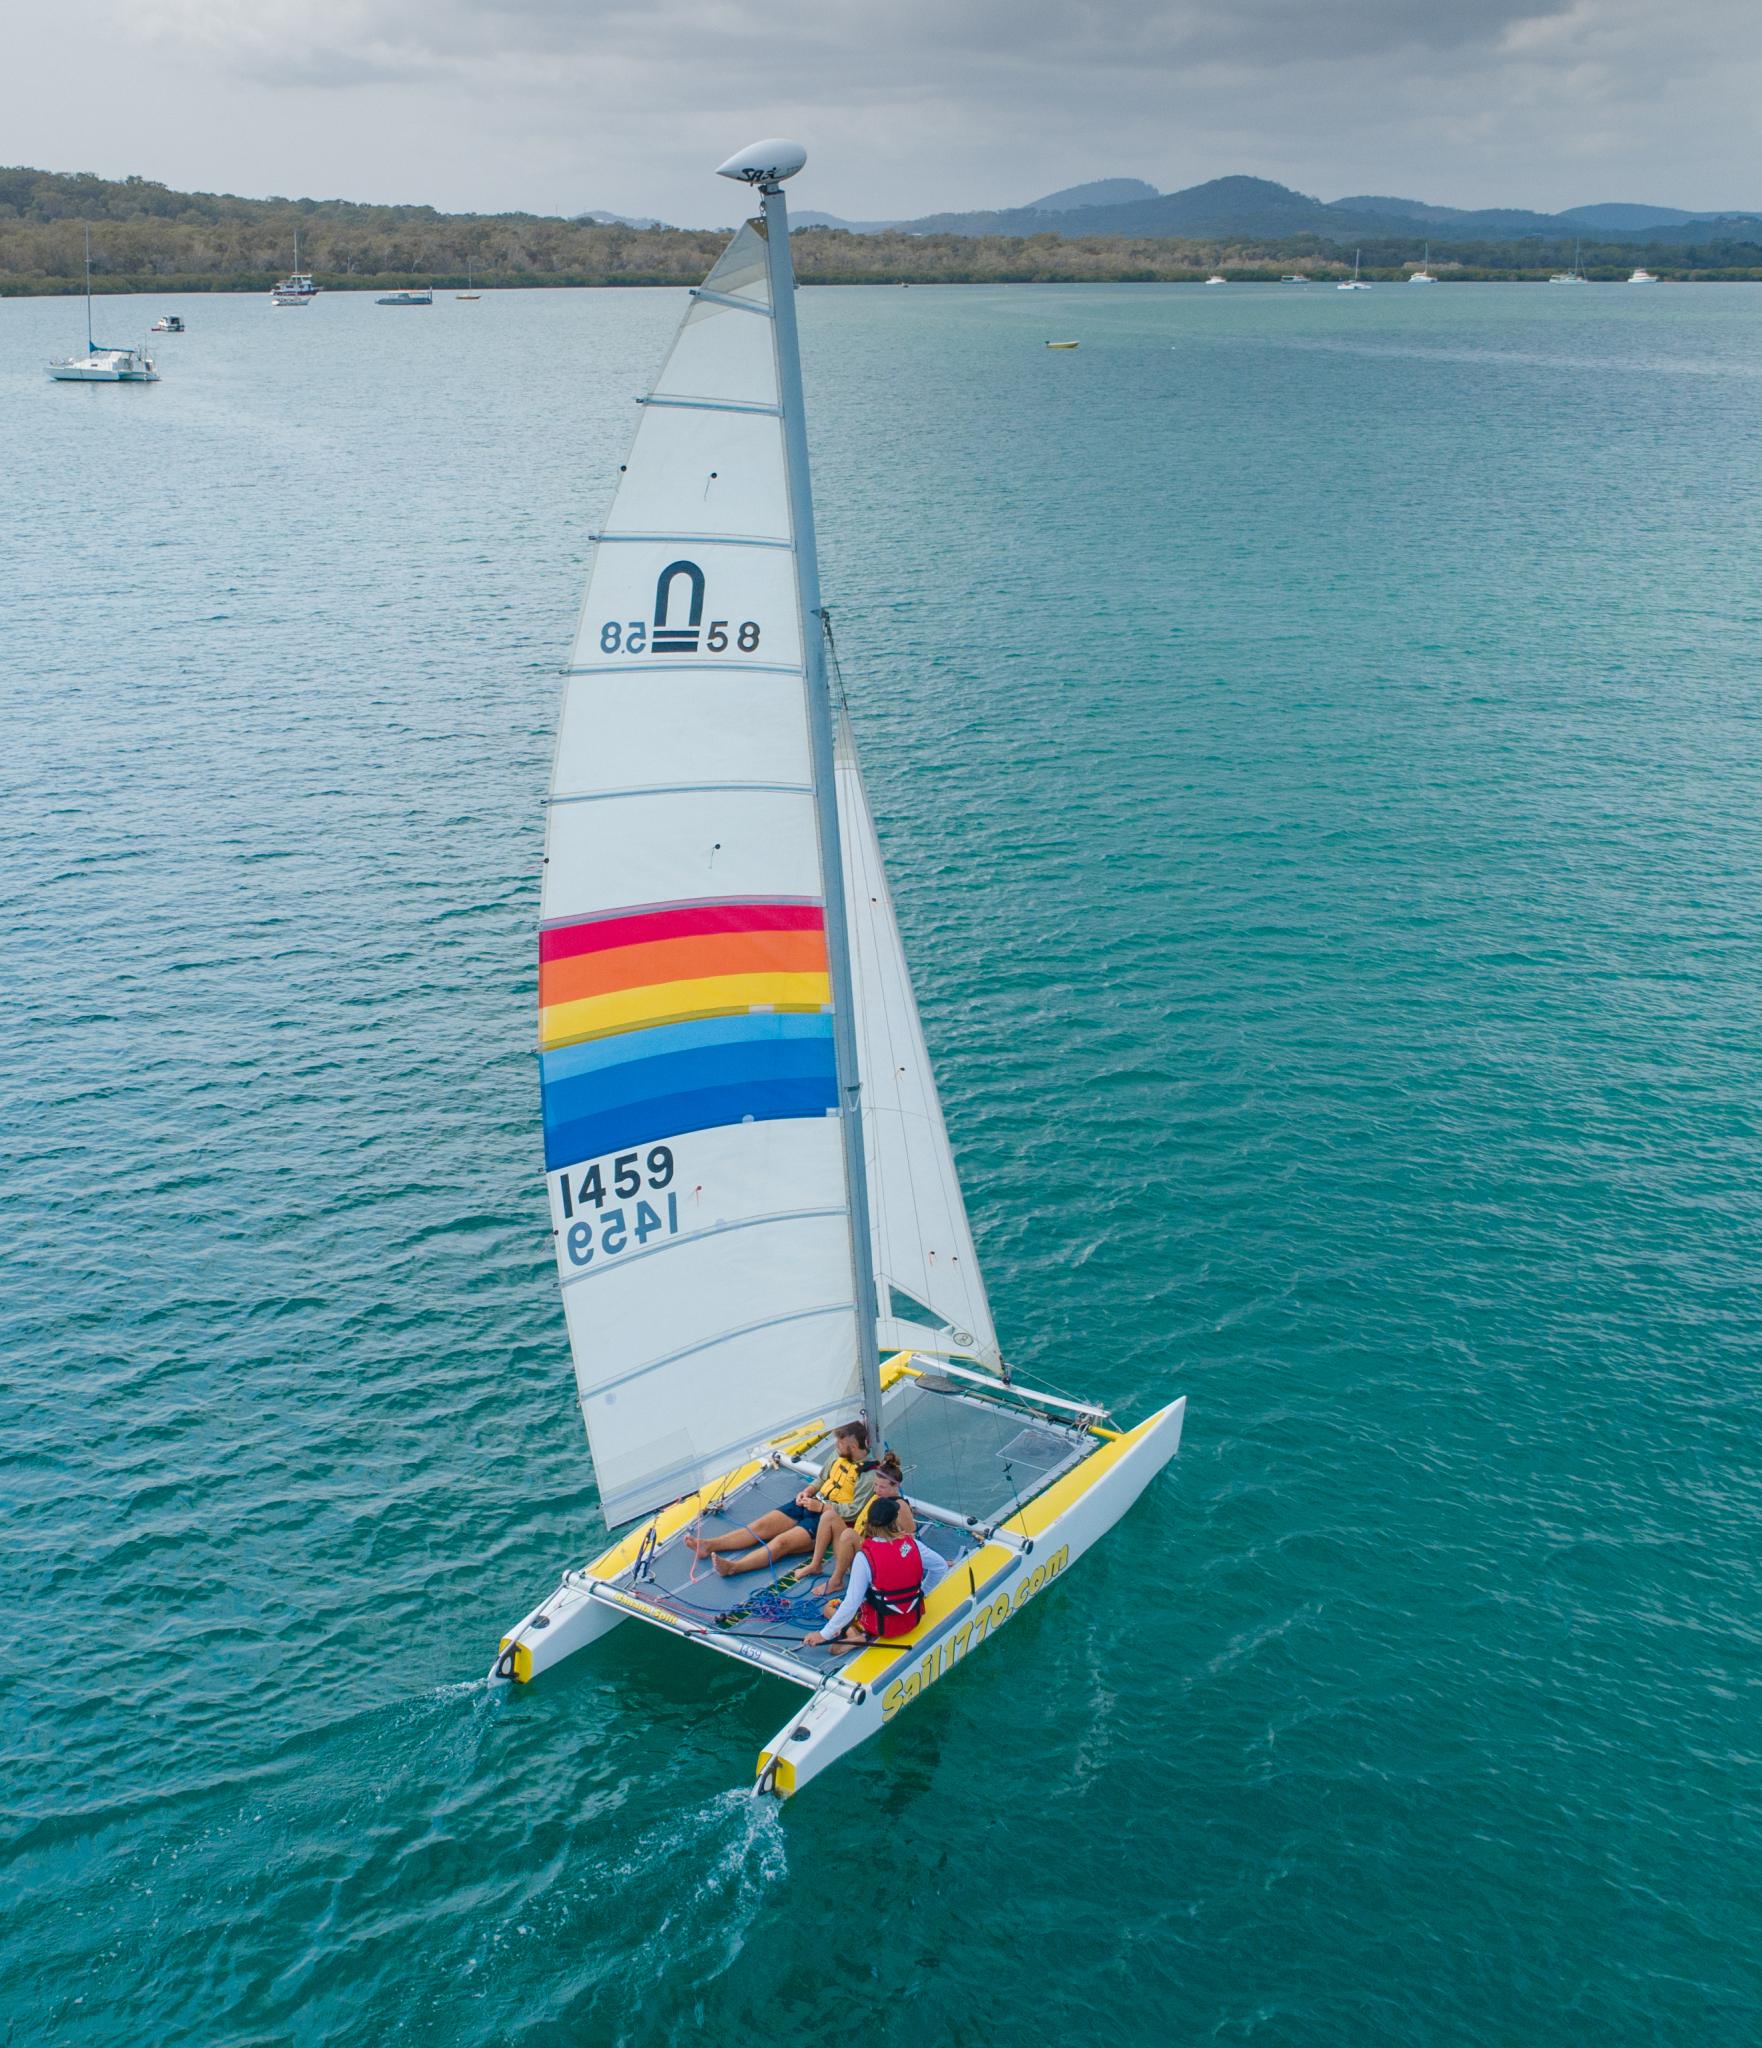 sailing 1770 agnes water